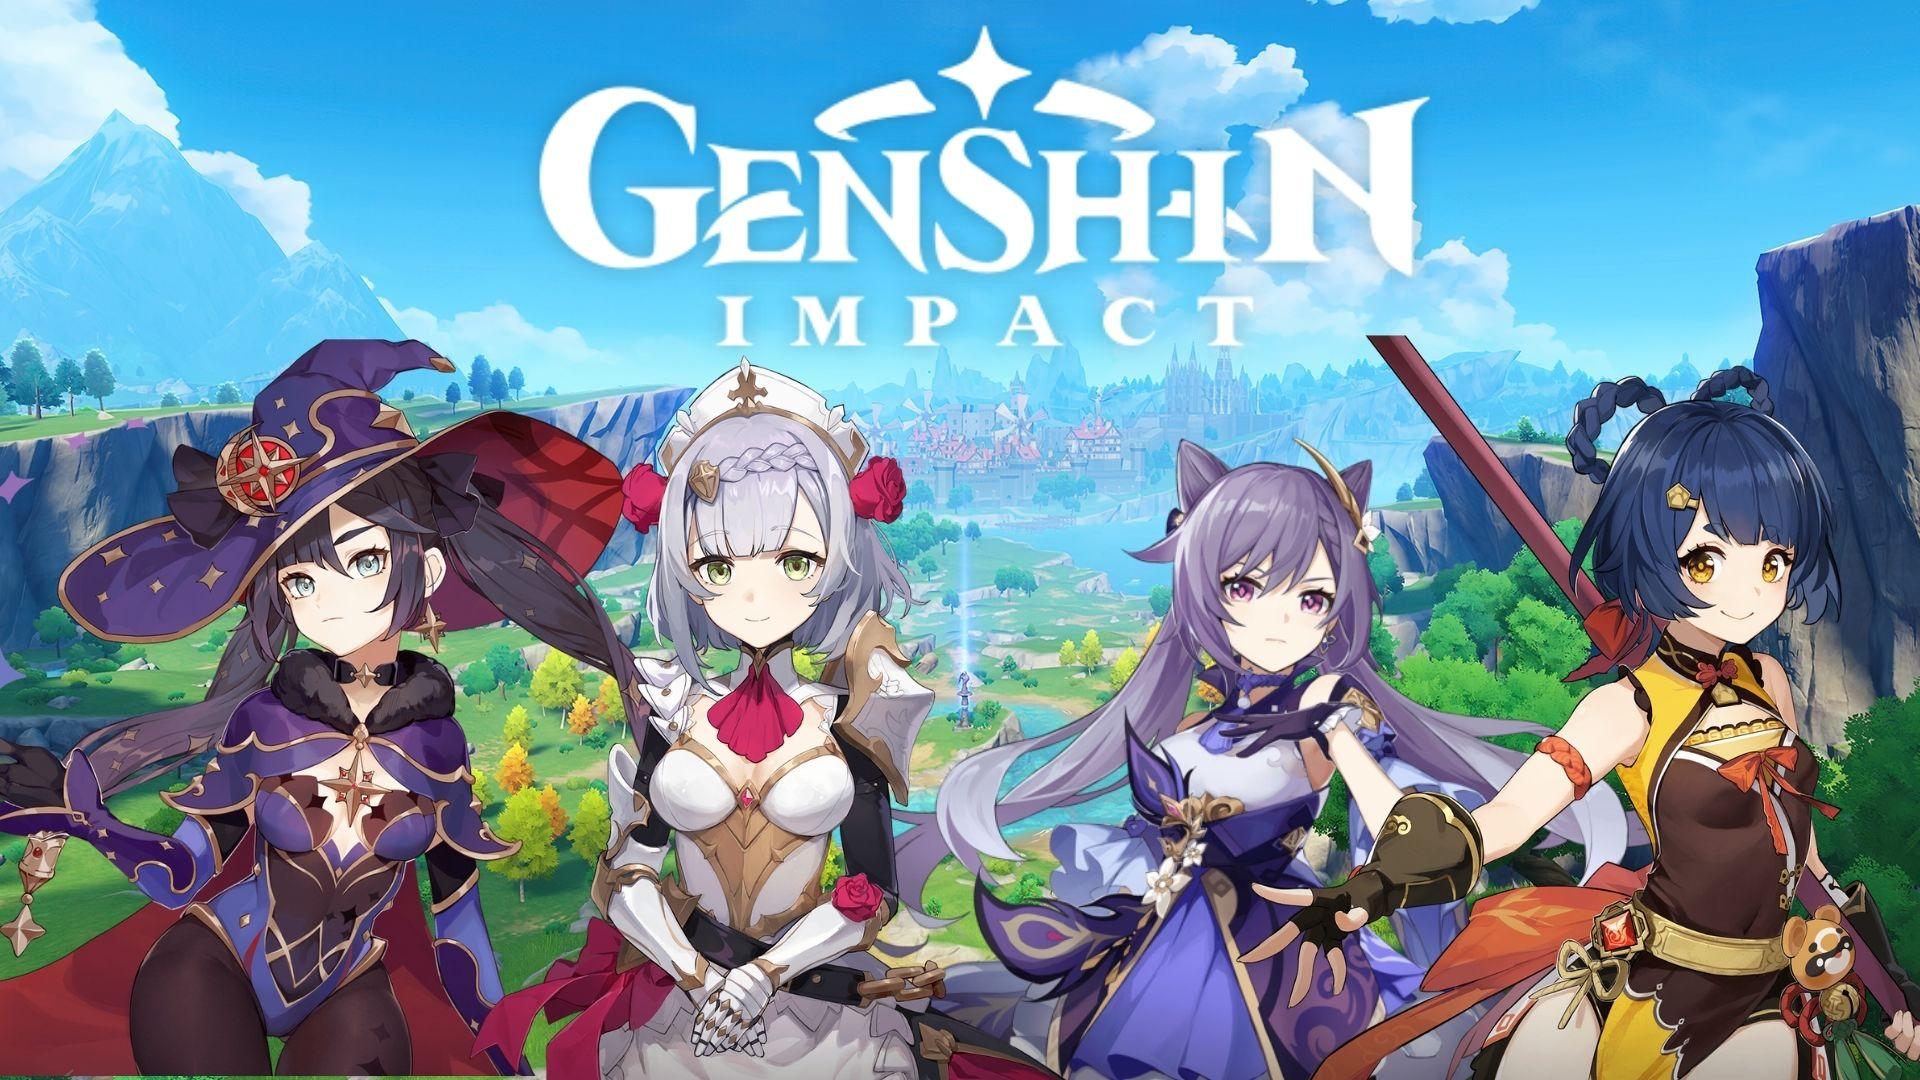 Genshin Impact characters next to the logo